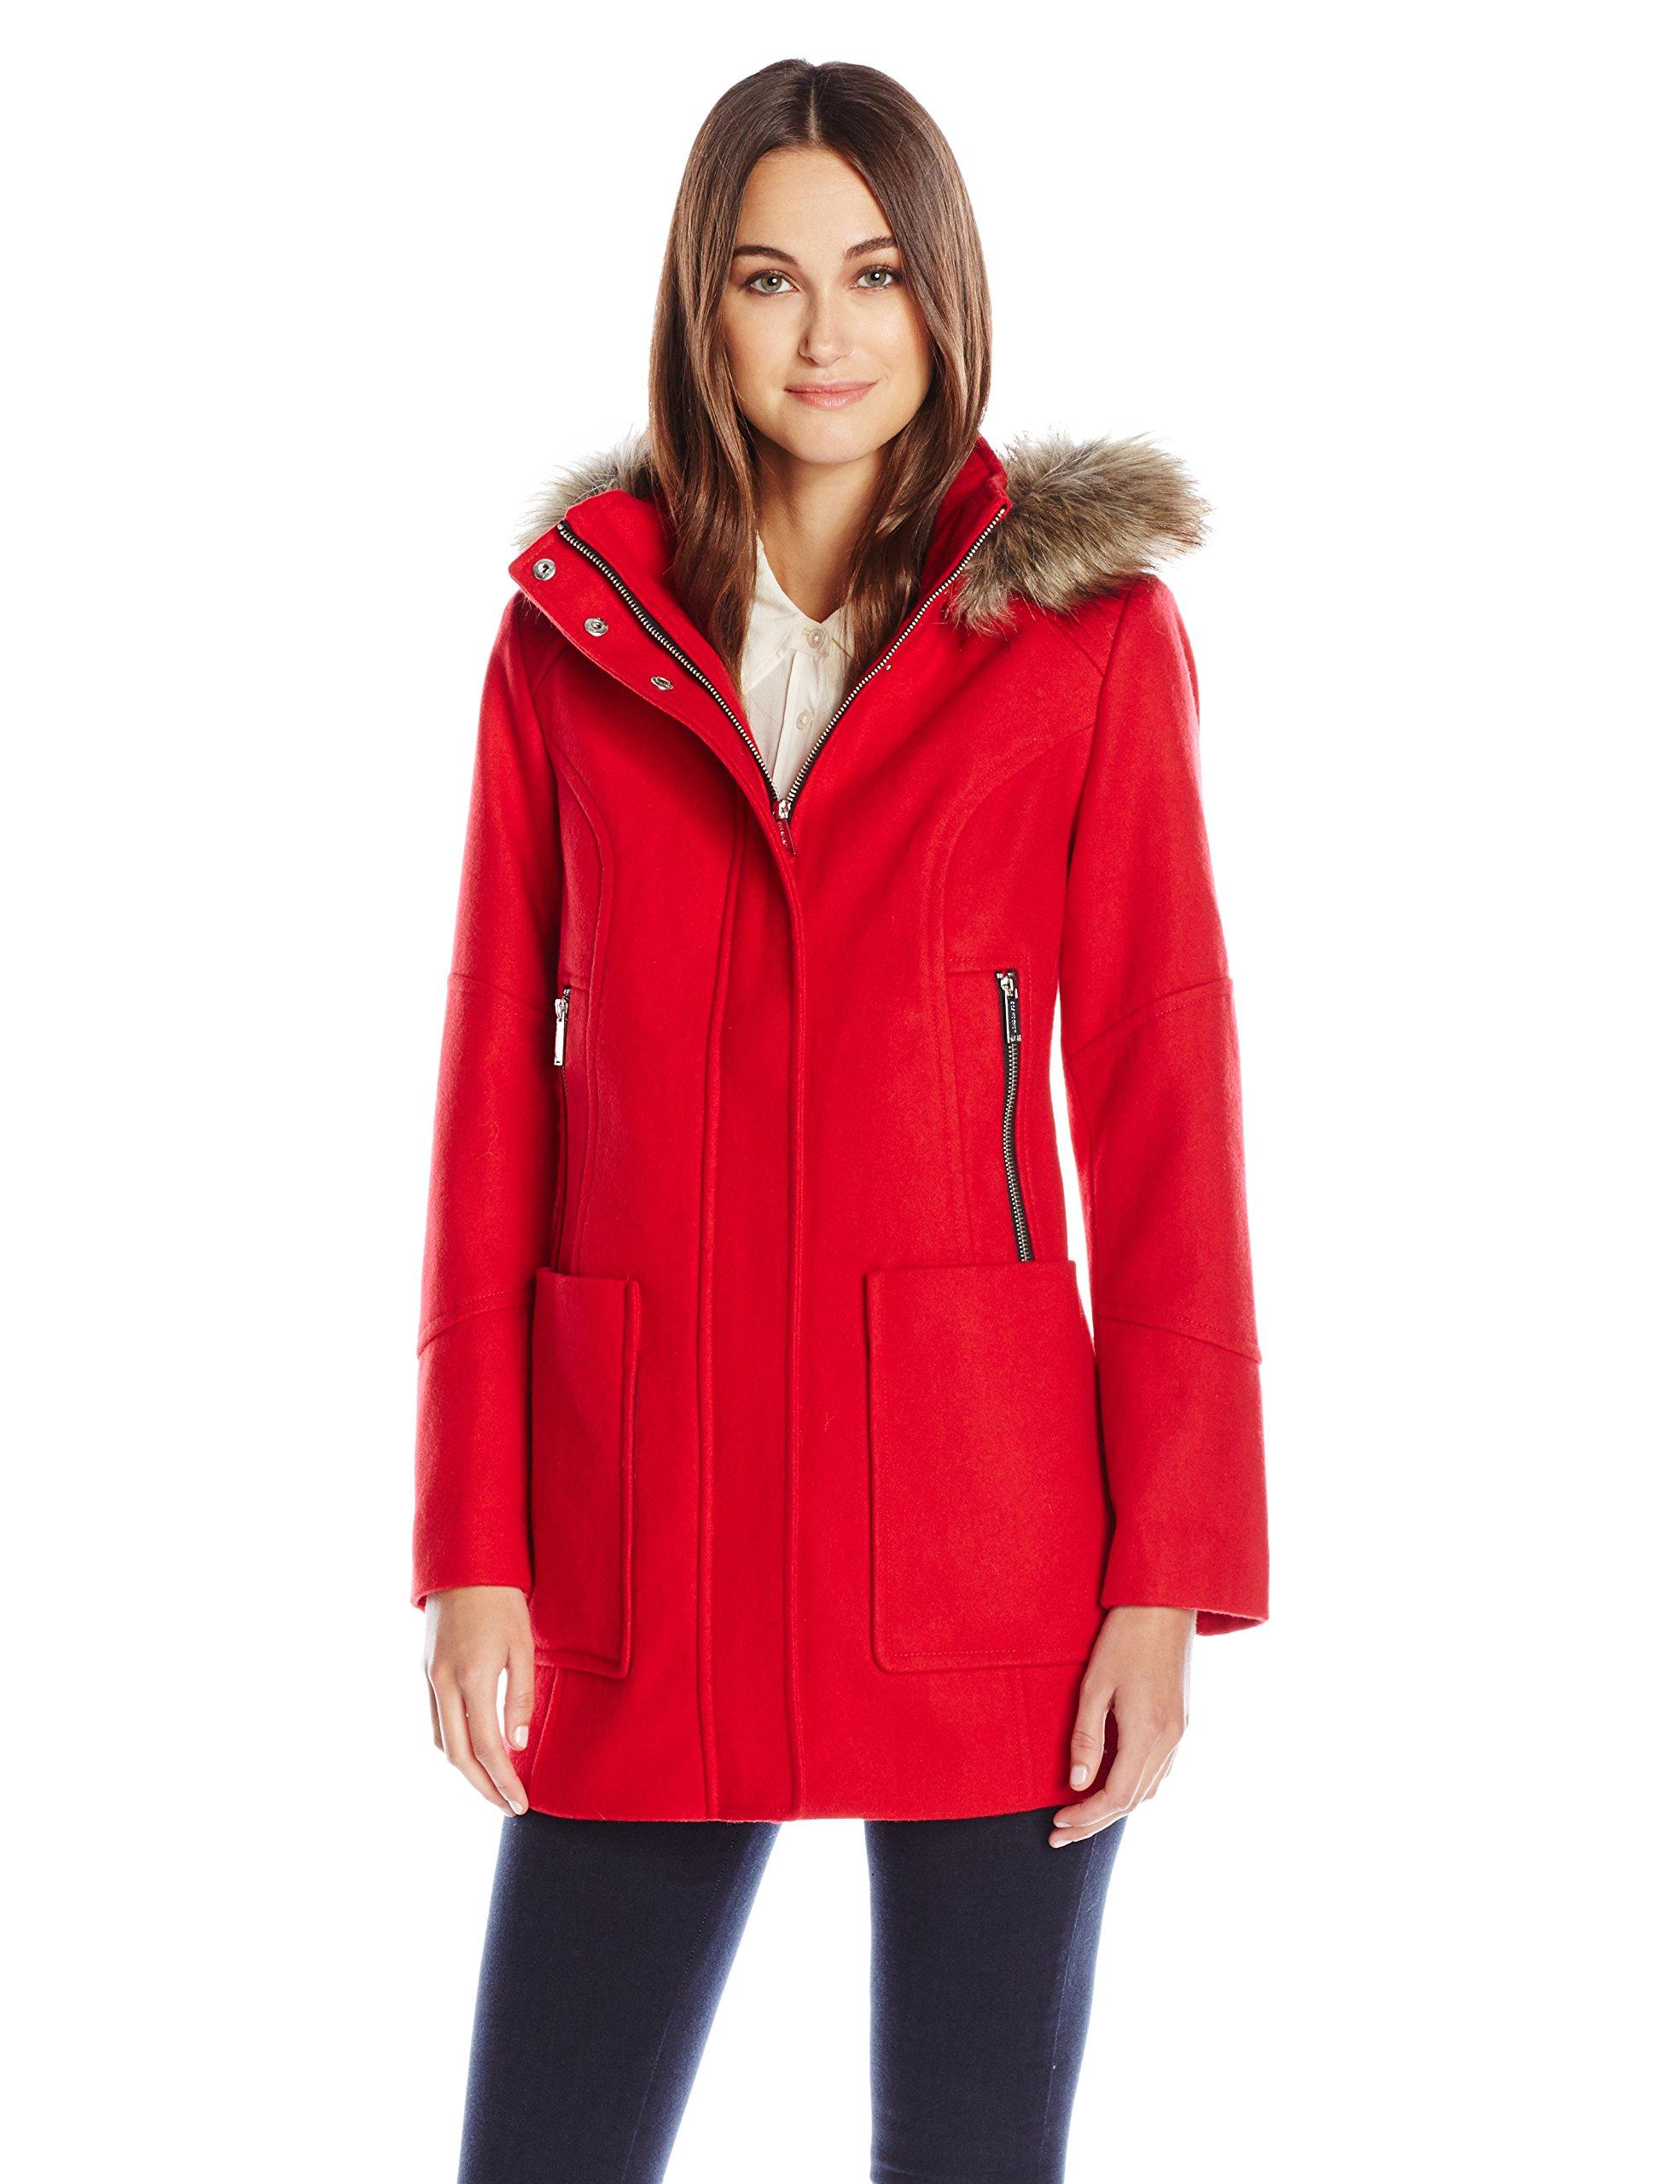 London Fog Women's 31'' Wool With Faux Fur Trim Hood, Red, S